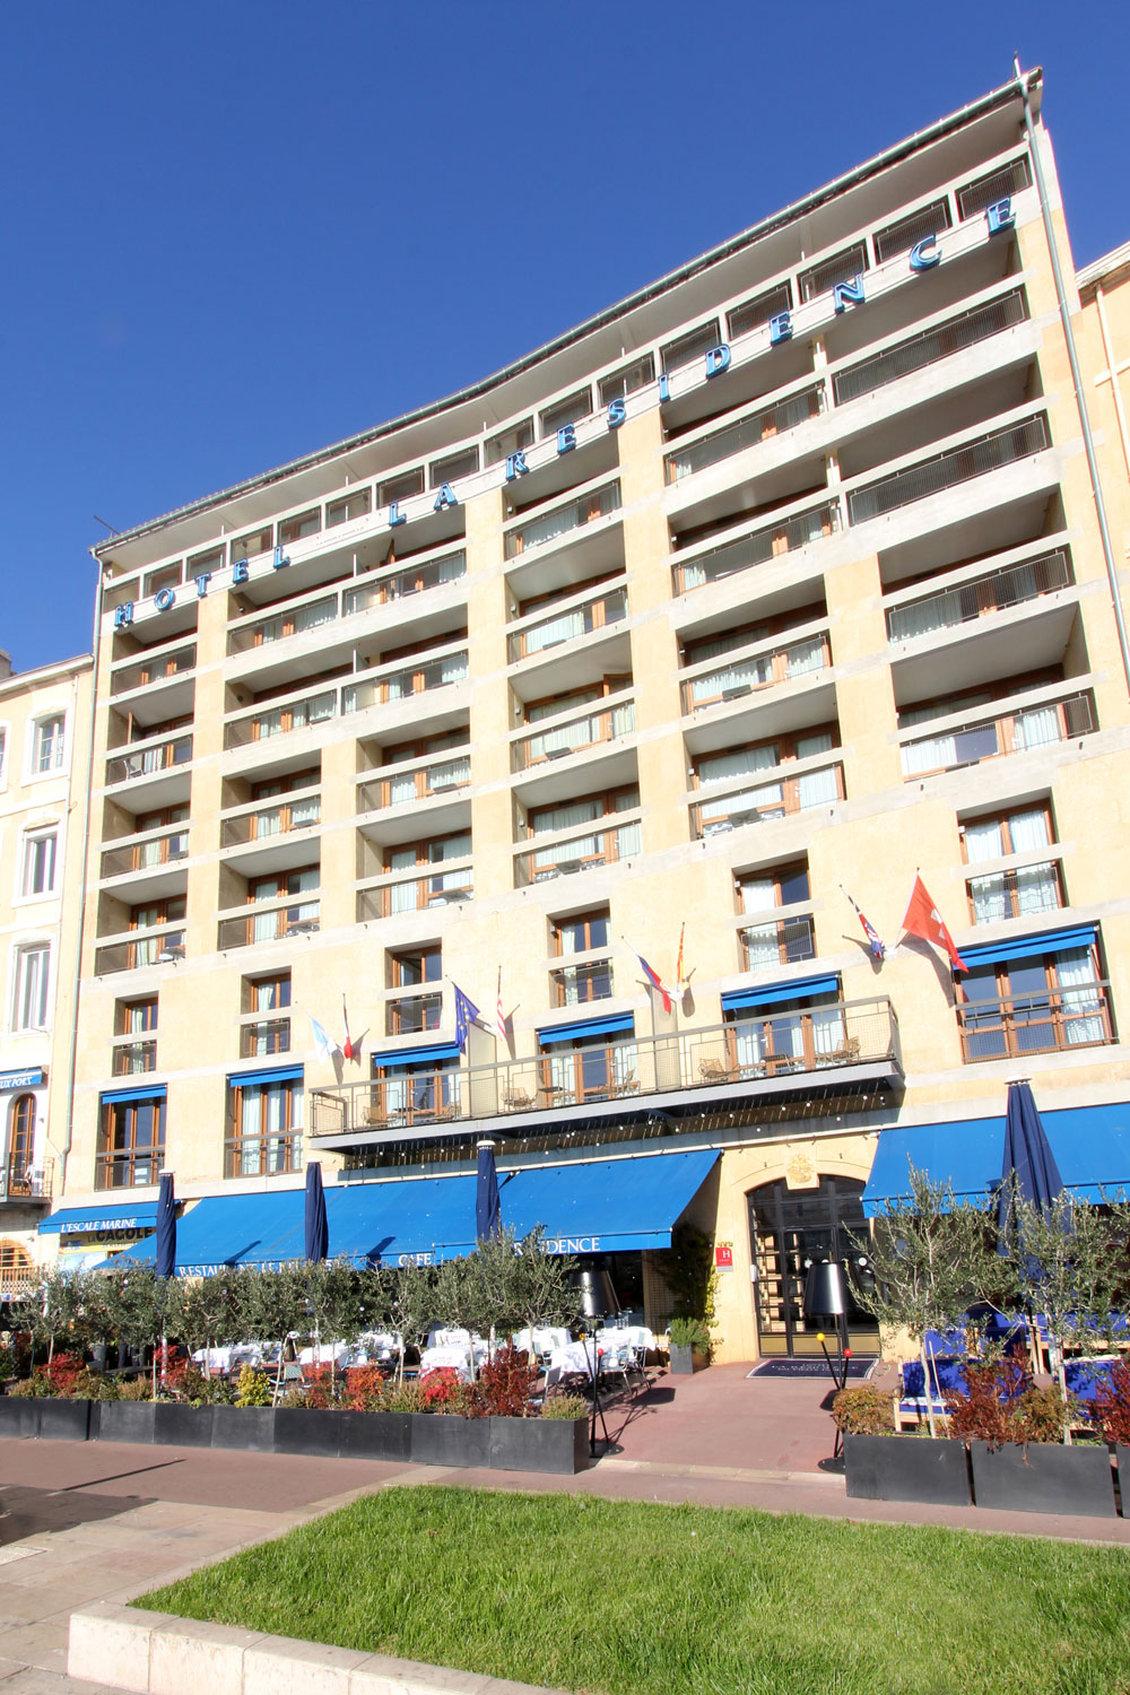 La Residence du-Vieux-Port Hotel